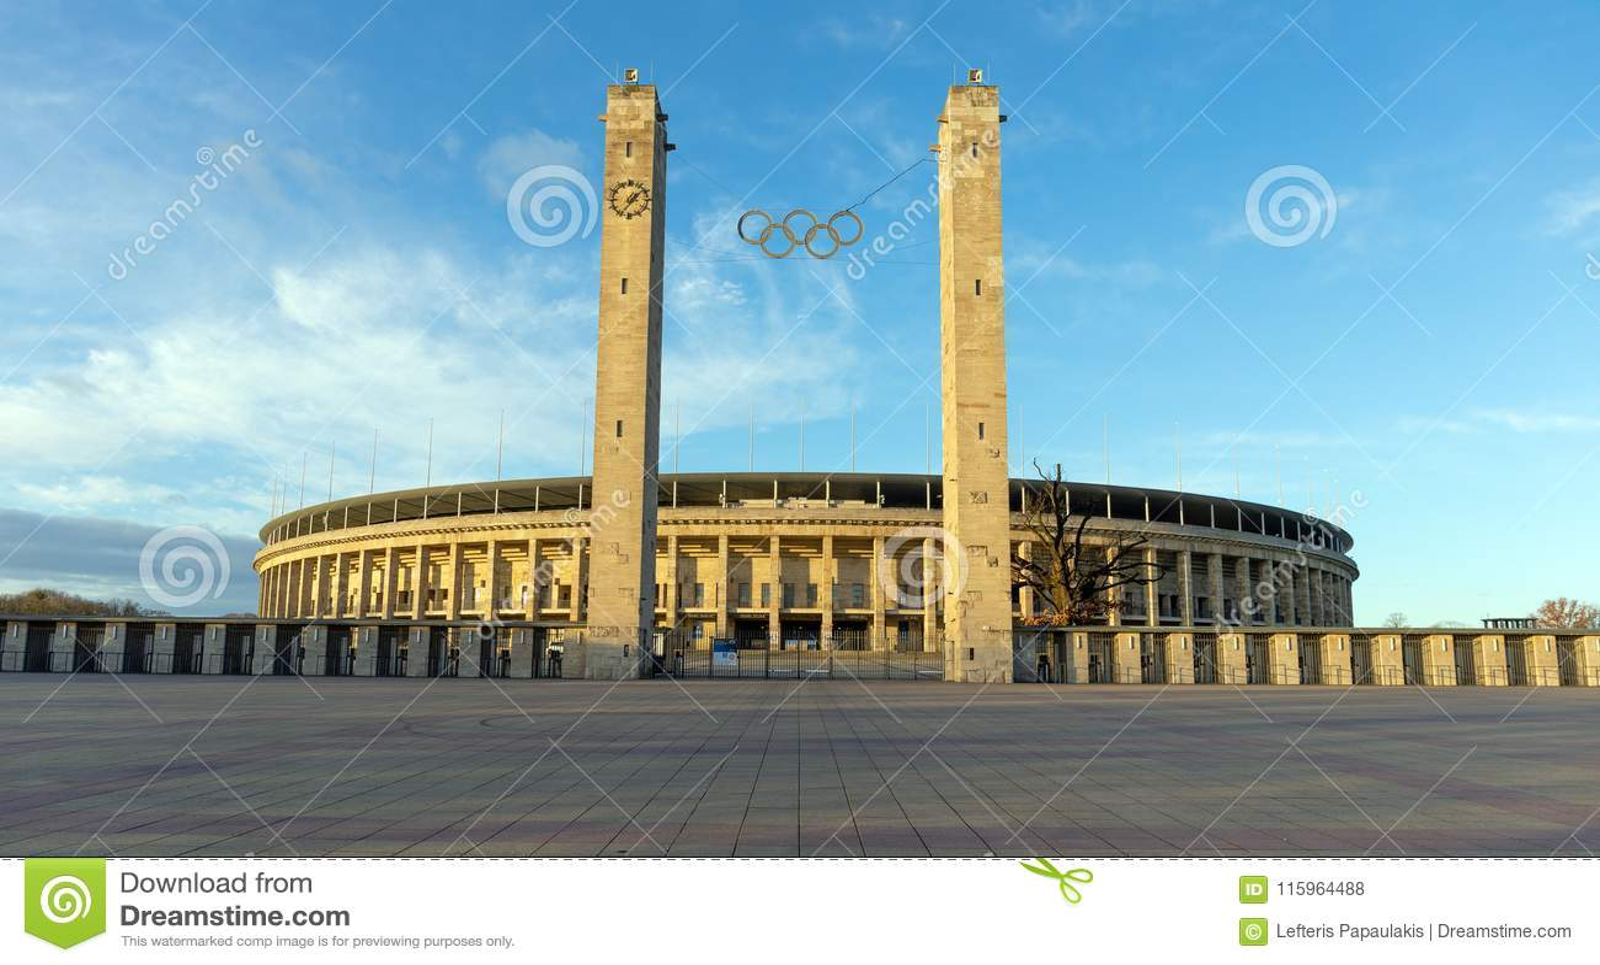 The Olympiastadion Berlin Germany Editorial Stock Photo Image Of Athletics Emblem 115964488